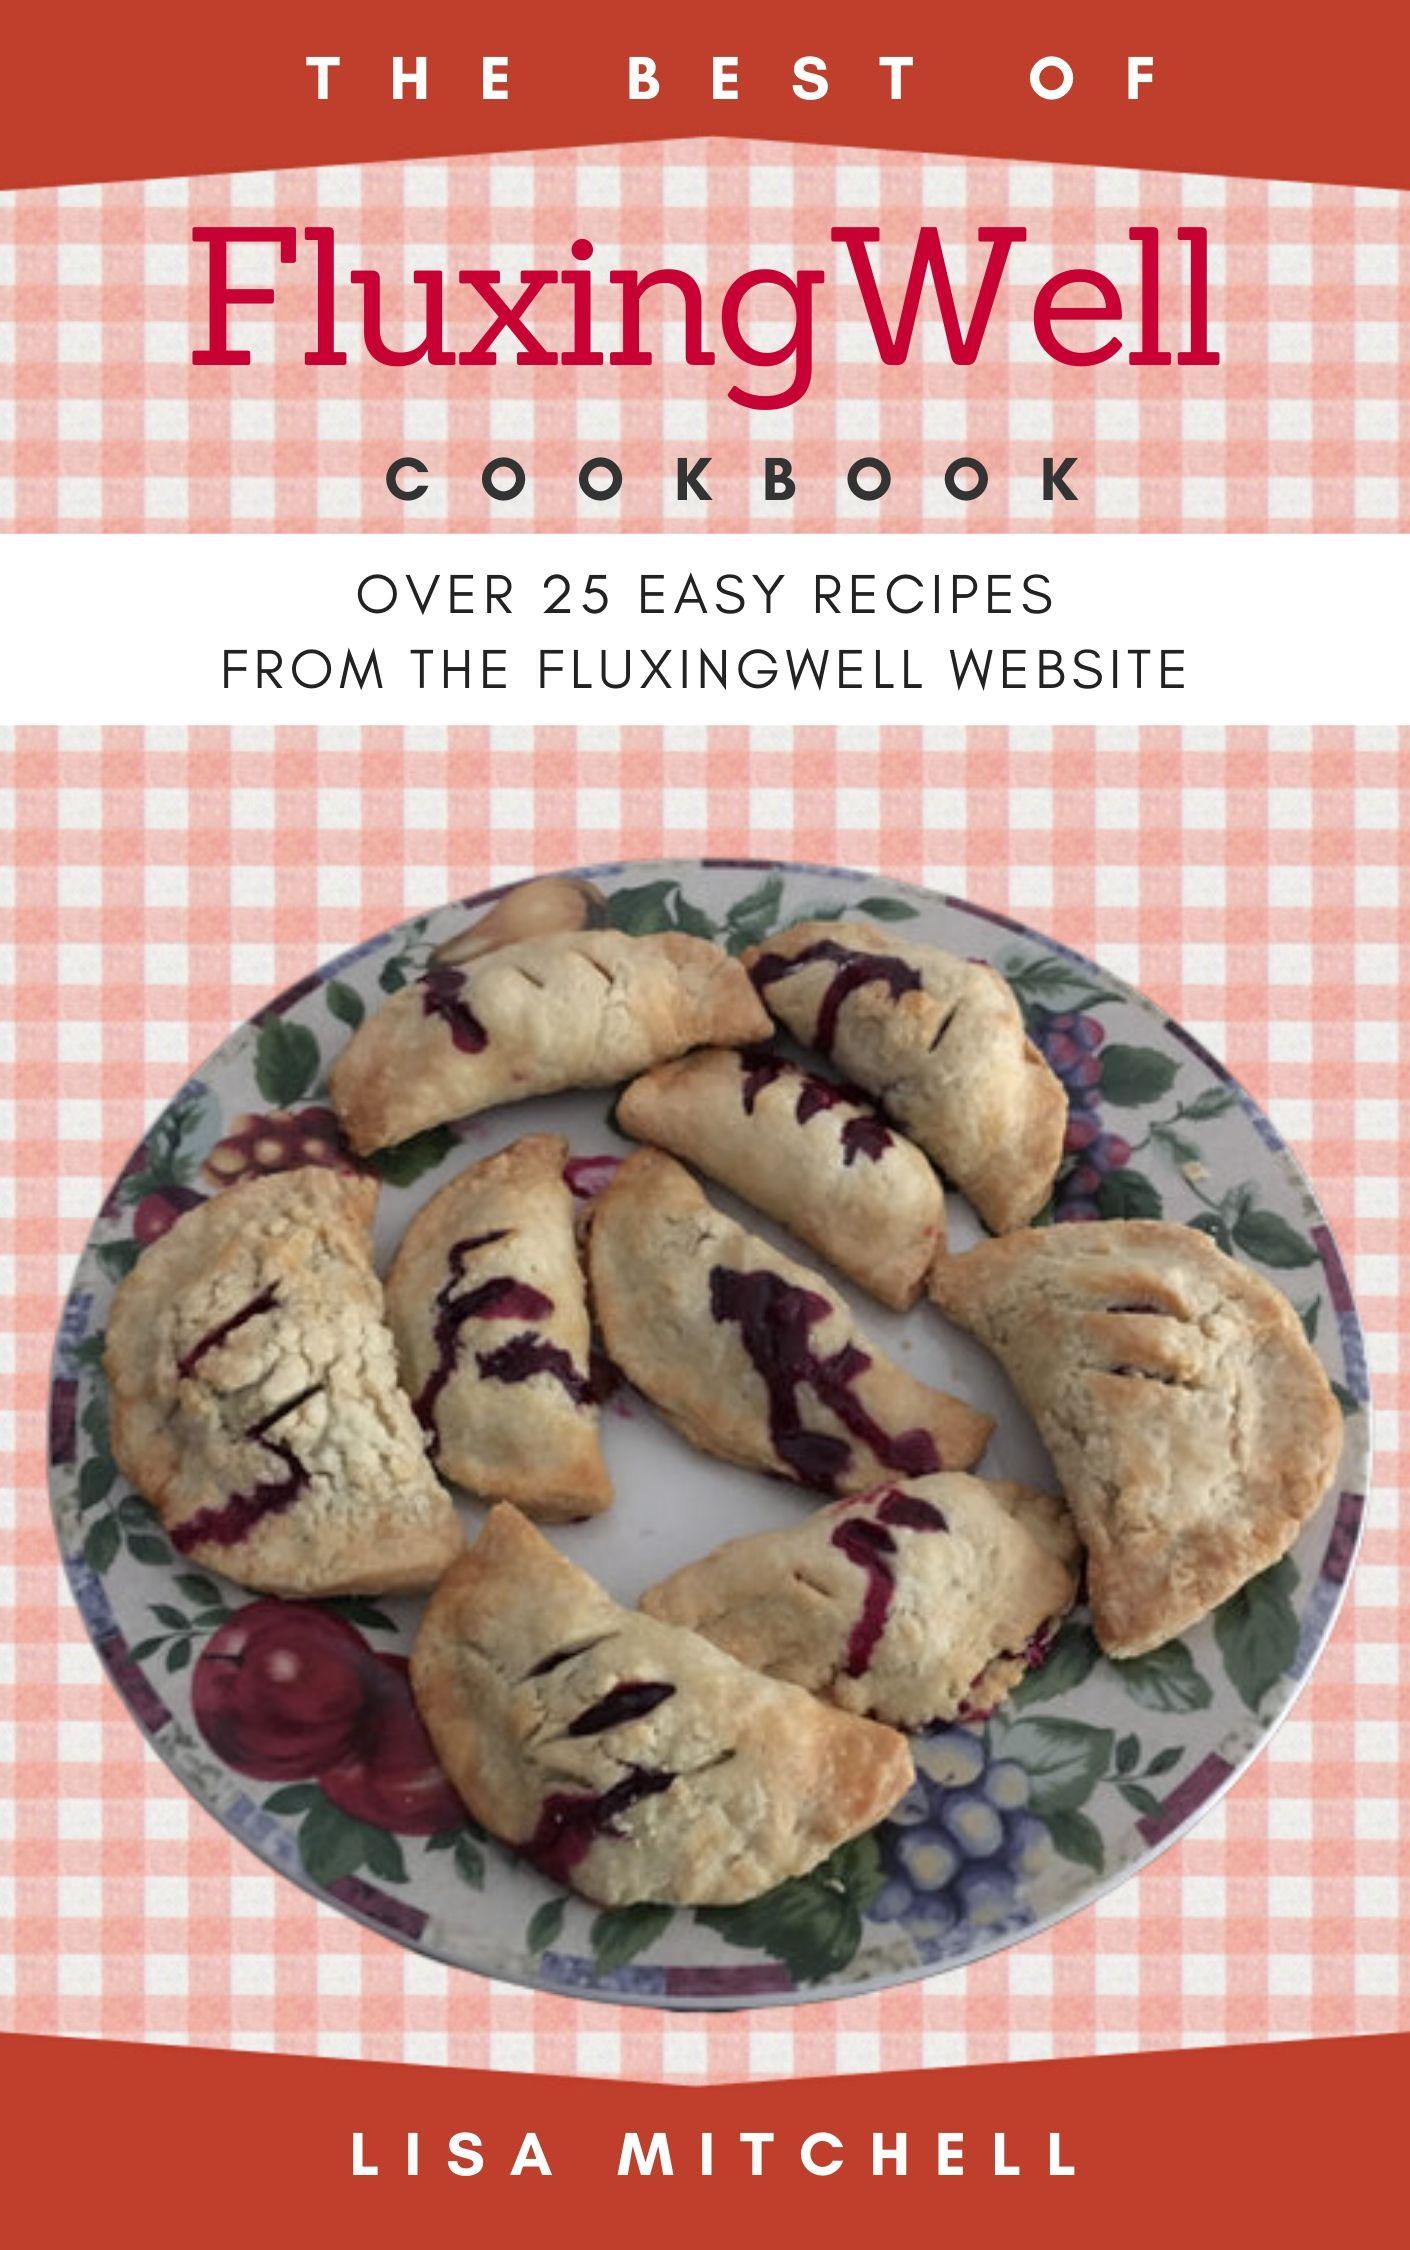 Easy White Chocolate Raspberry Scones Fluxing Well Cookbook